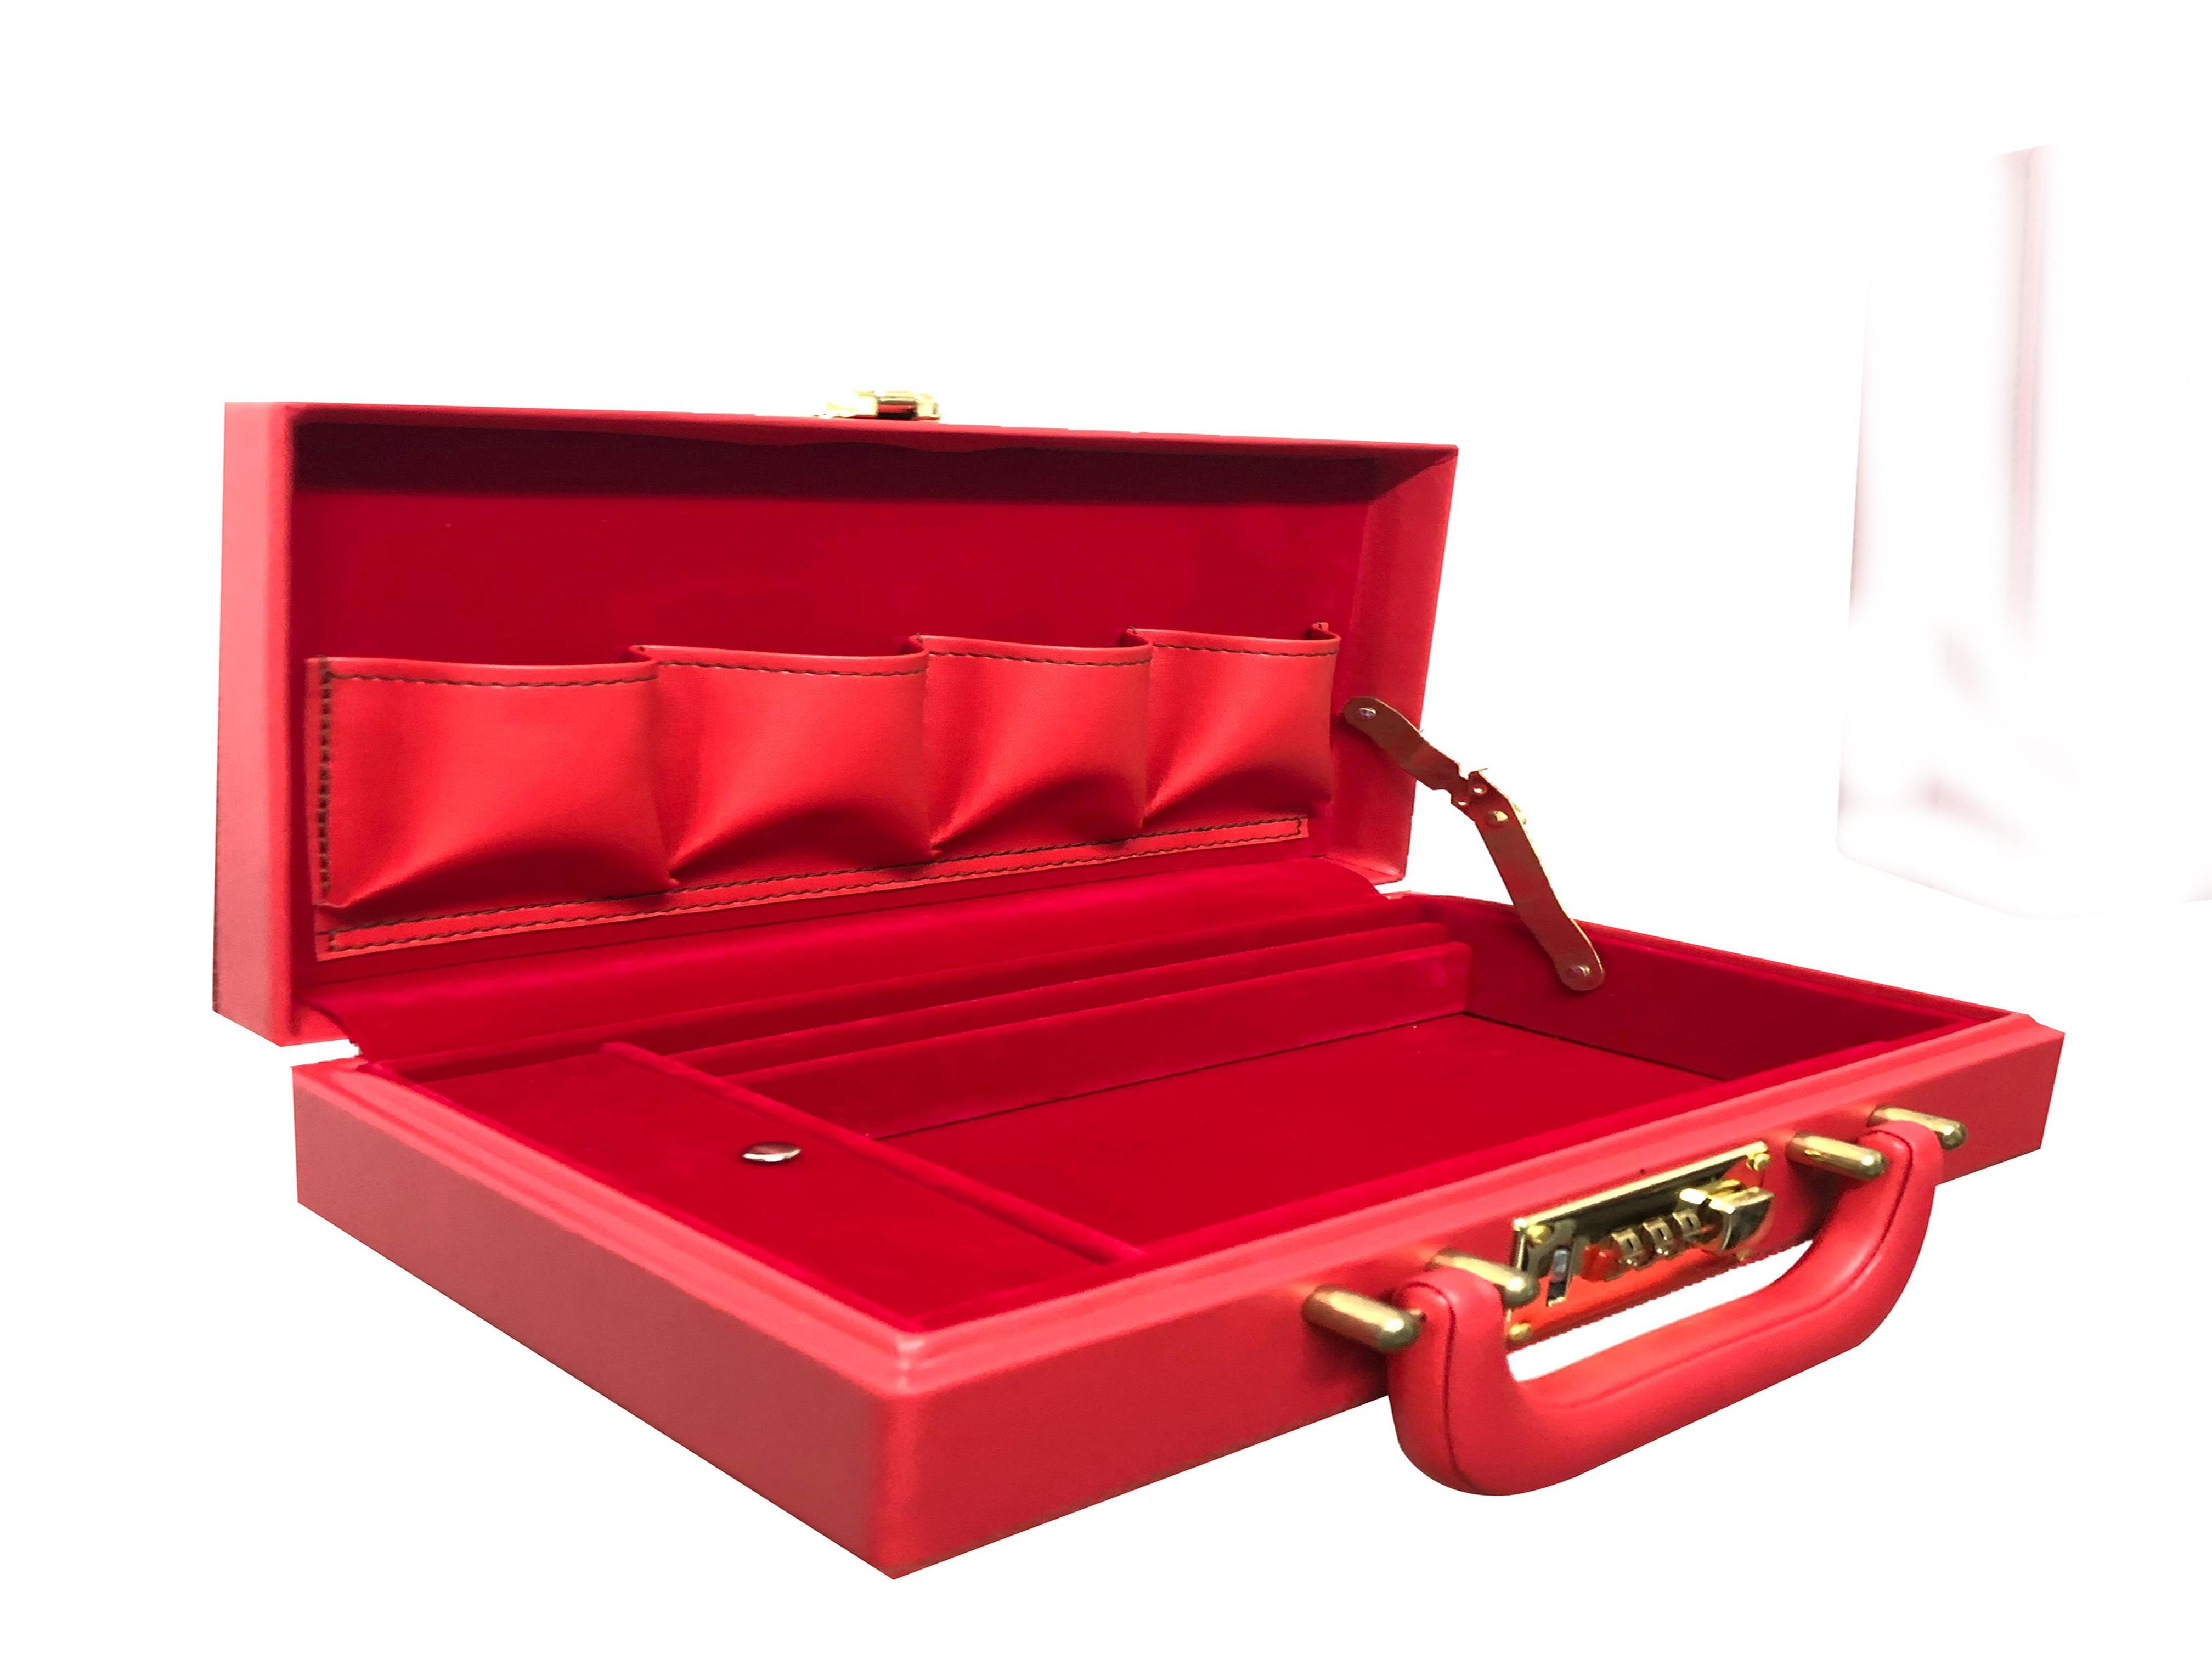 Ordinary Tari Case 48 pcs Tari Capacity (Red) for Gamefowl Rooster  Enthusiast